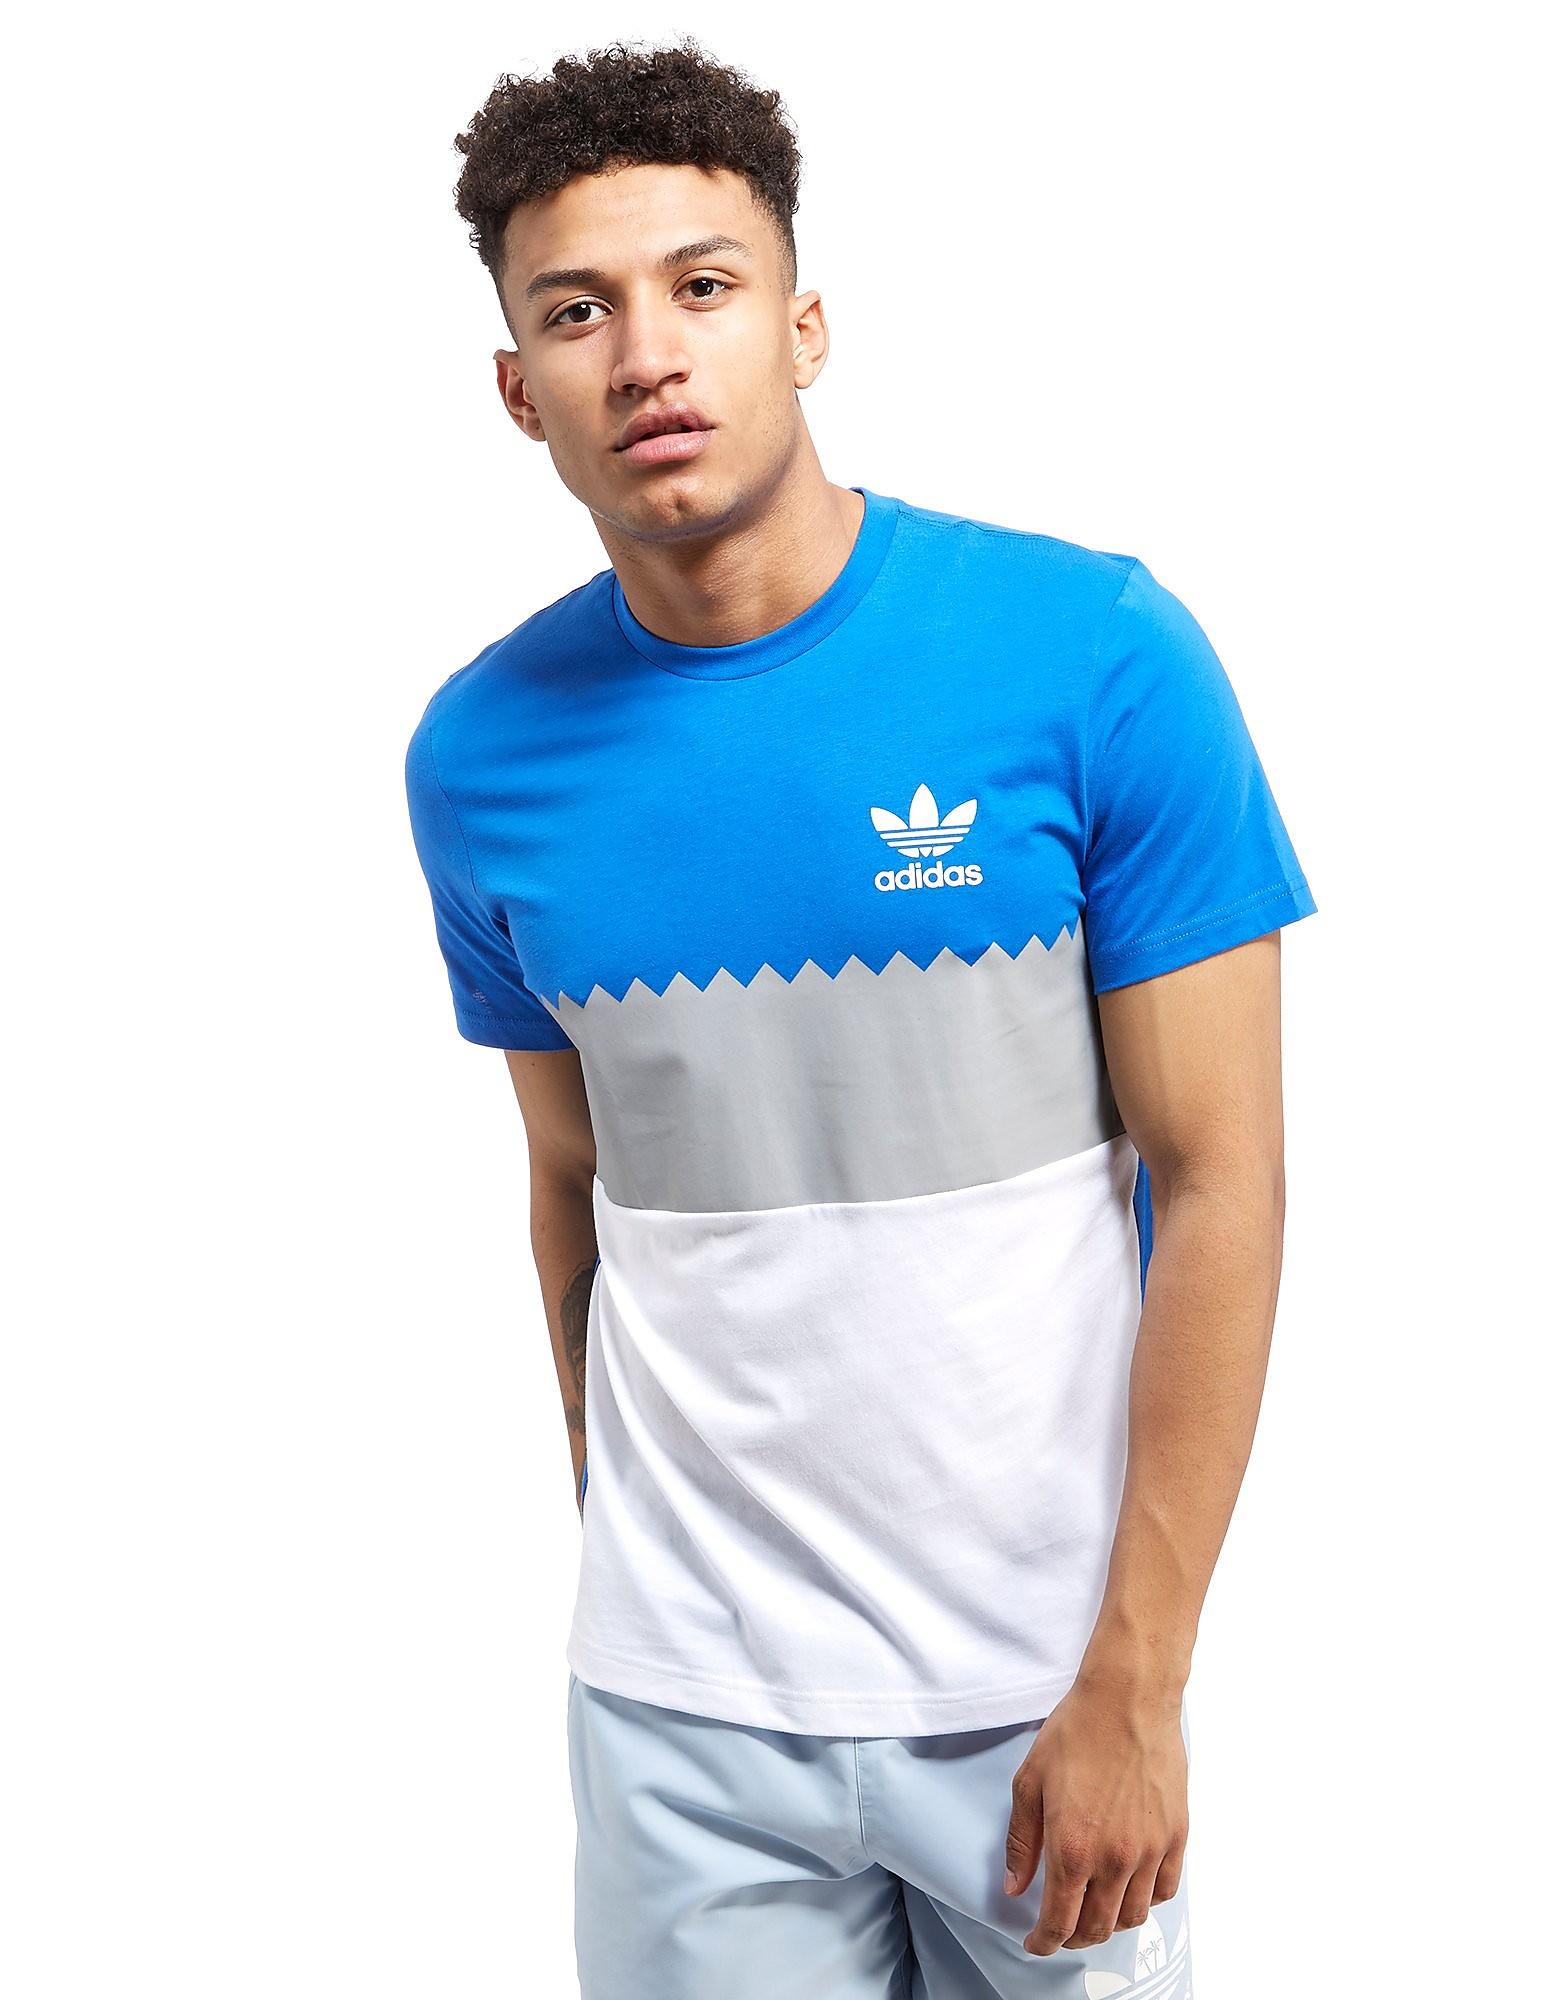 adidas Originals T-shirt Serrated Homme